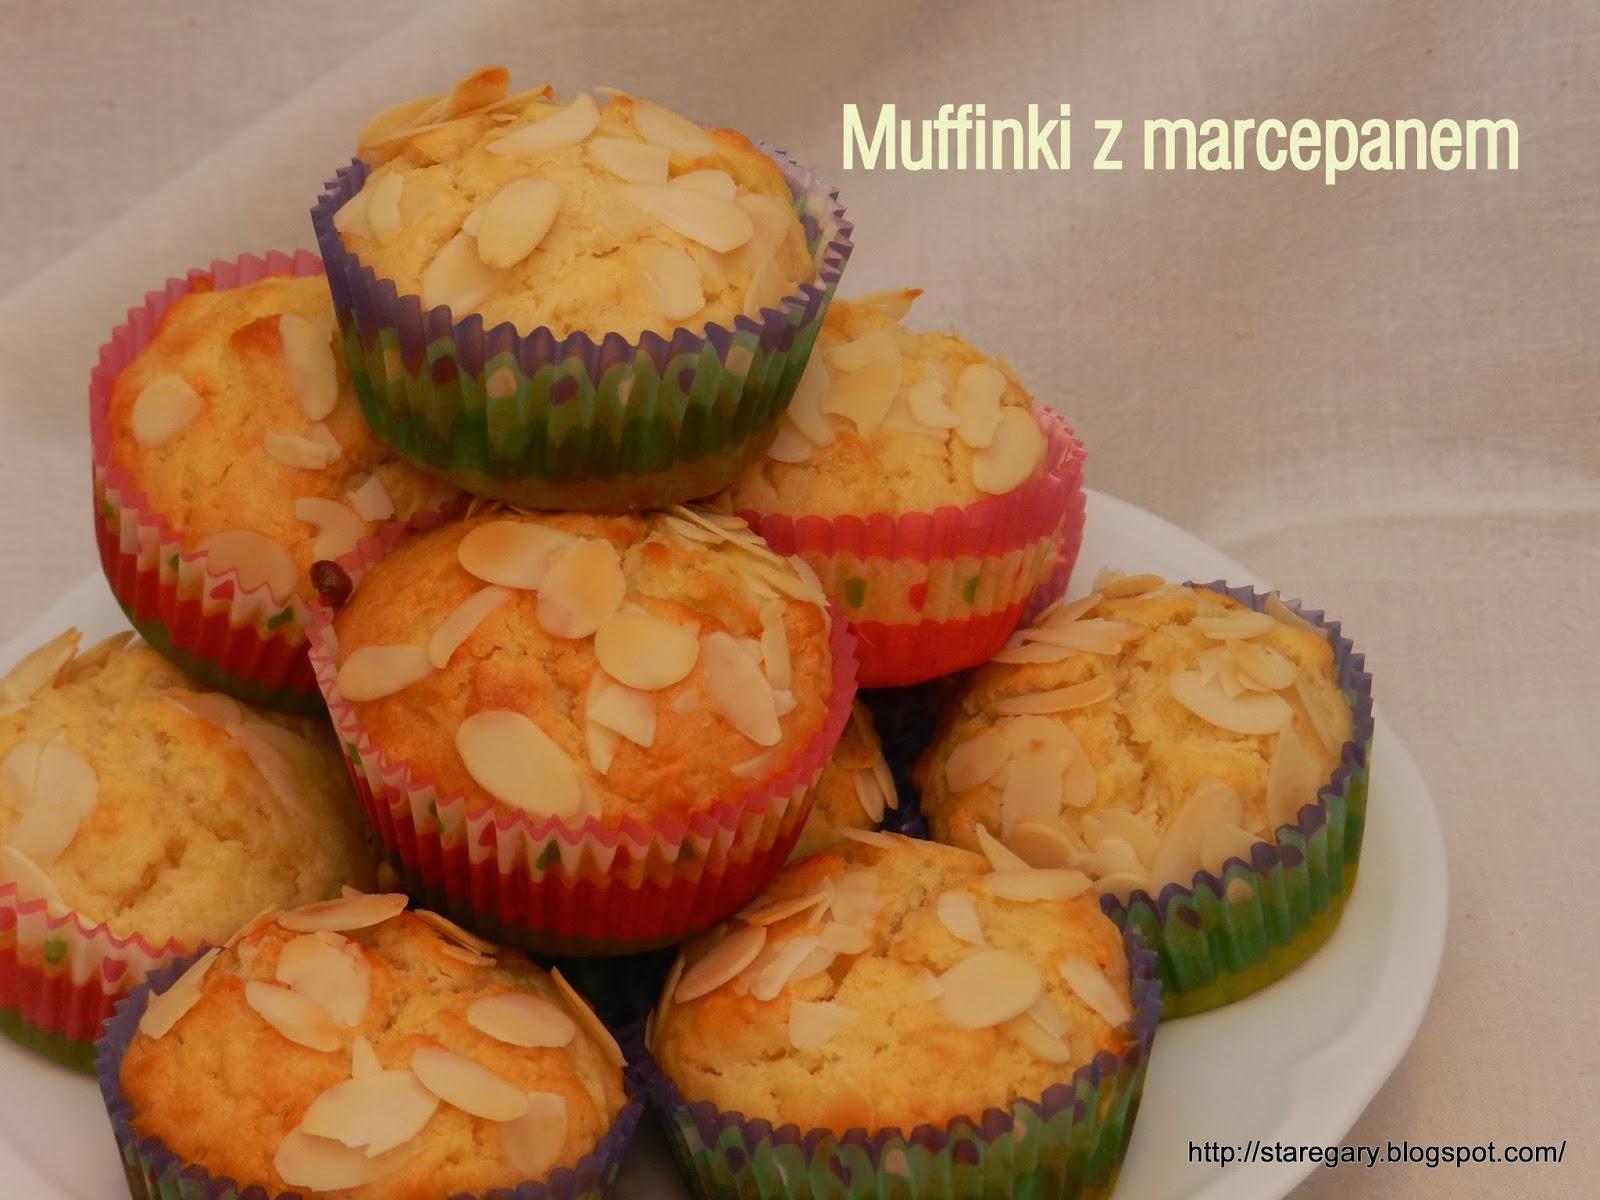 Muffinki z marcepanem